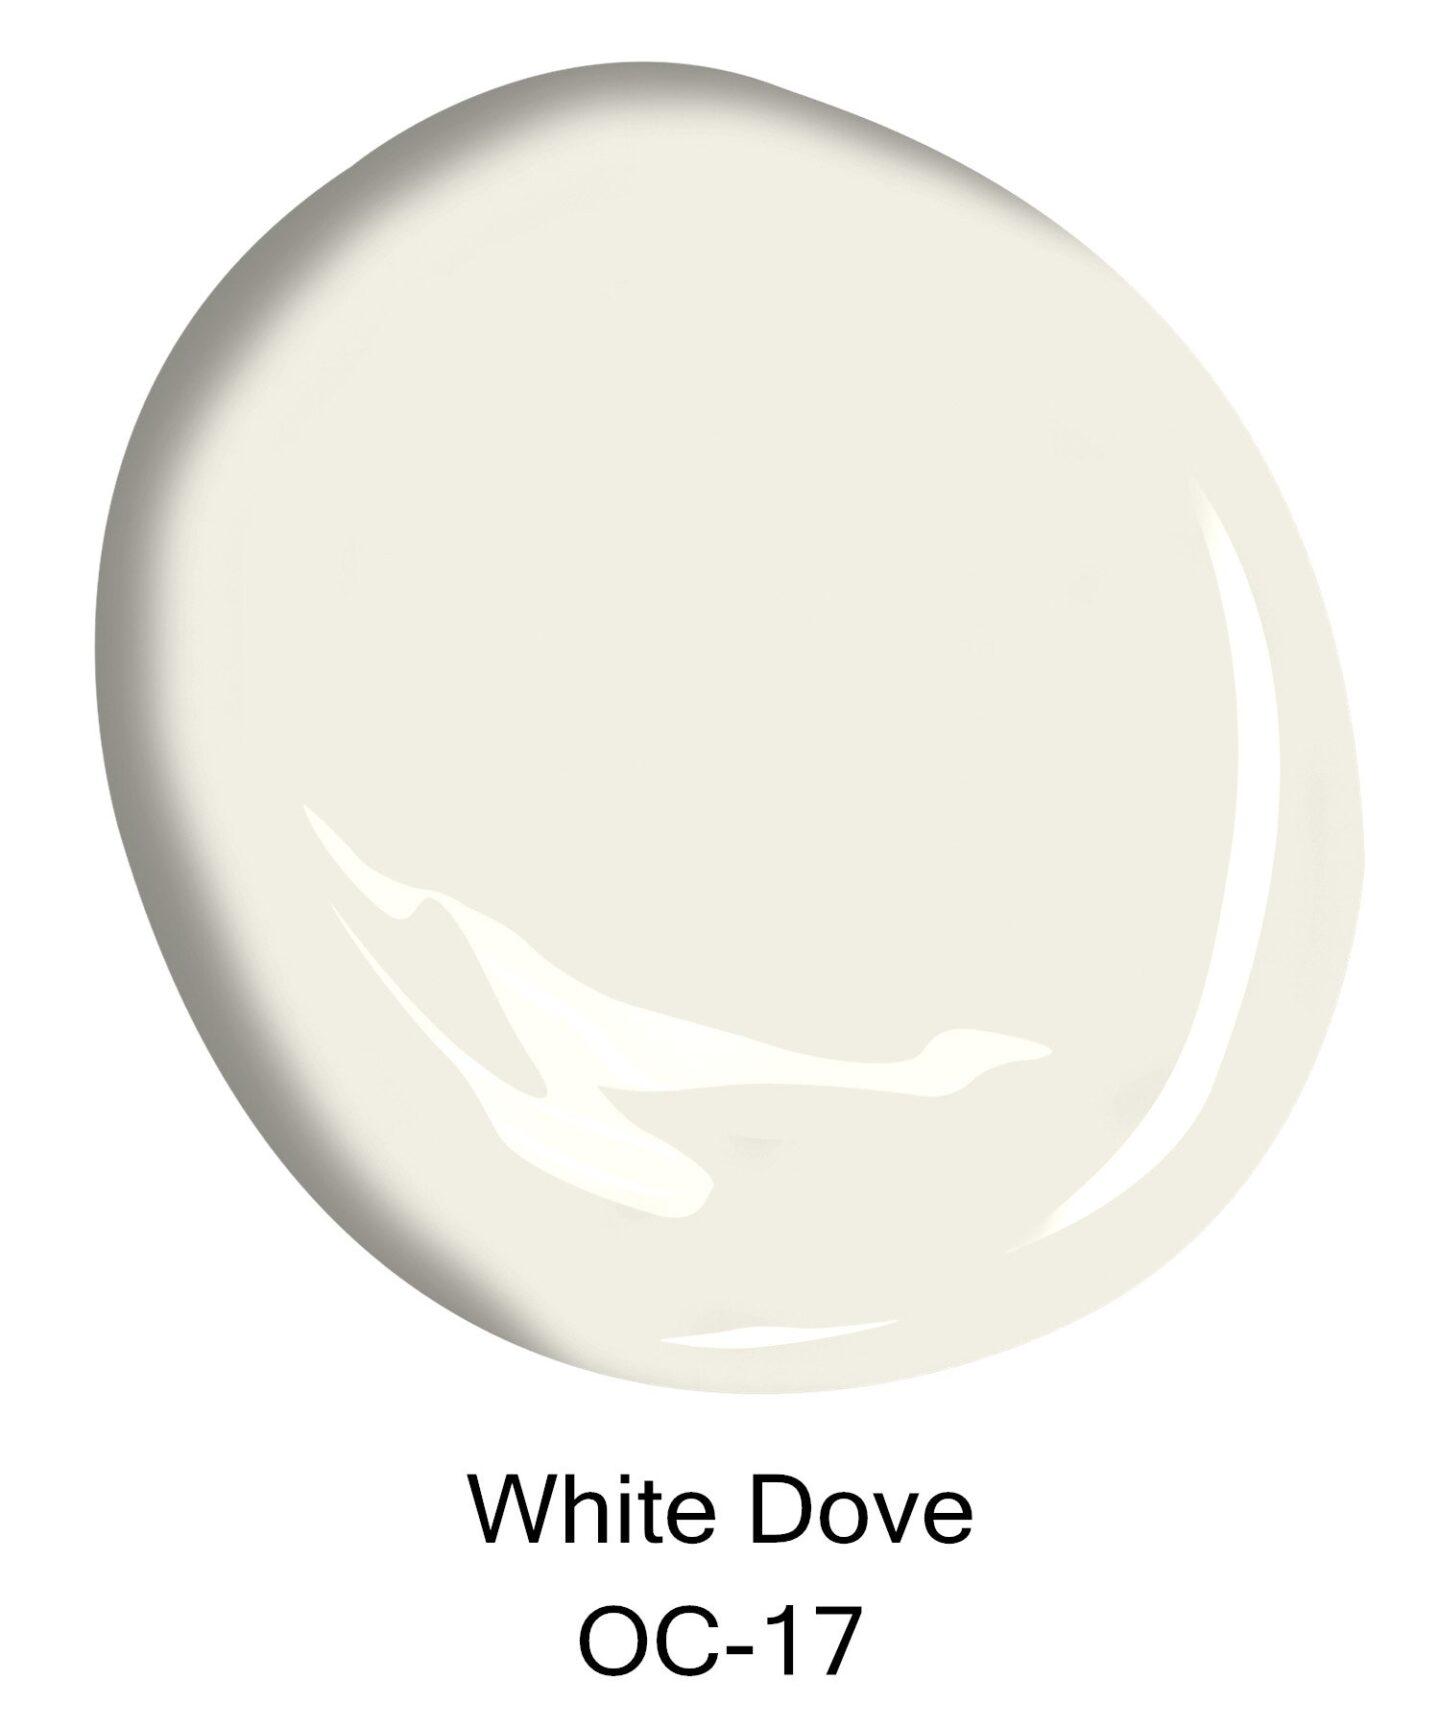 White Dove (Bejamin Moore) paint color swatch. #paintcolors #benjaminmoorewhitedove #whitedove #whitepaintcolors